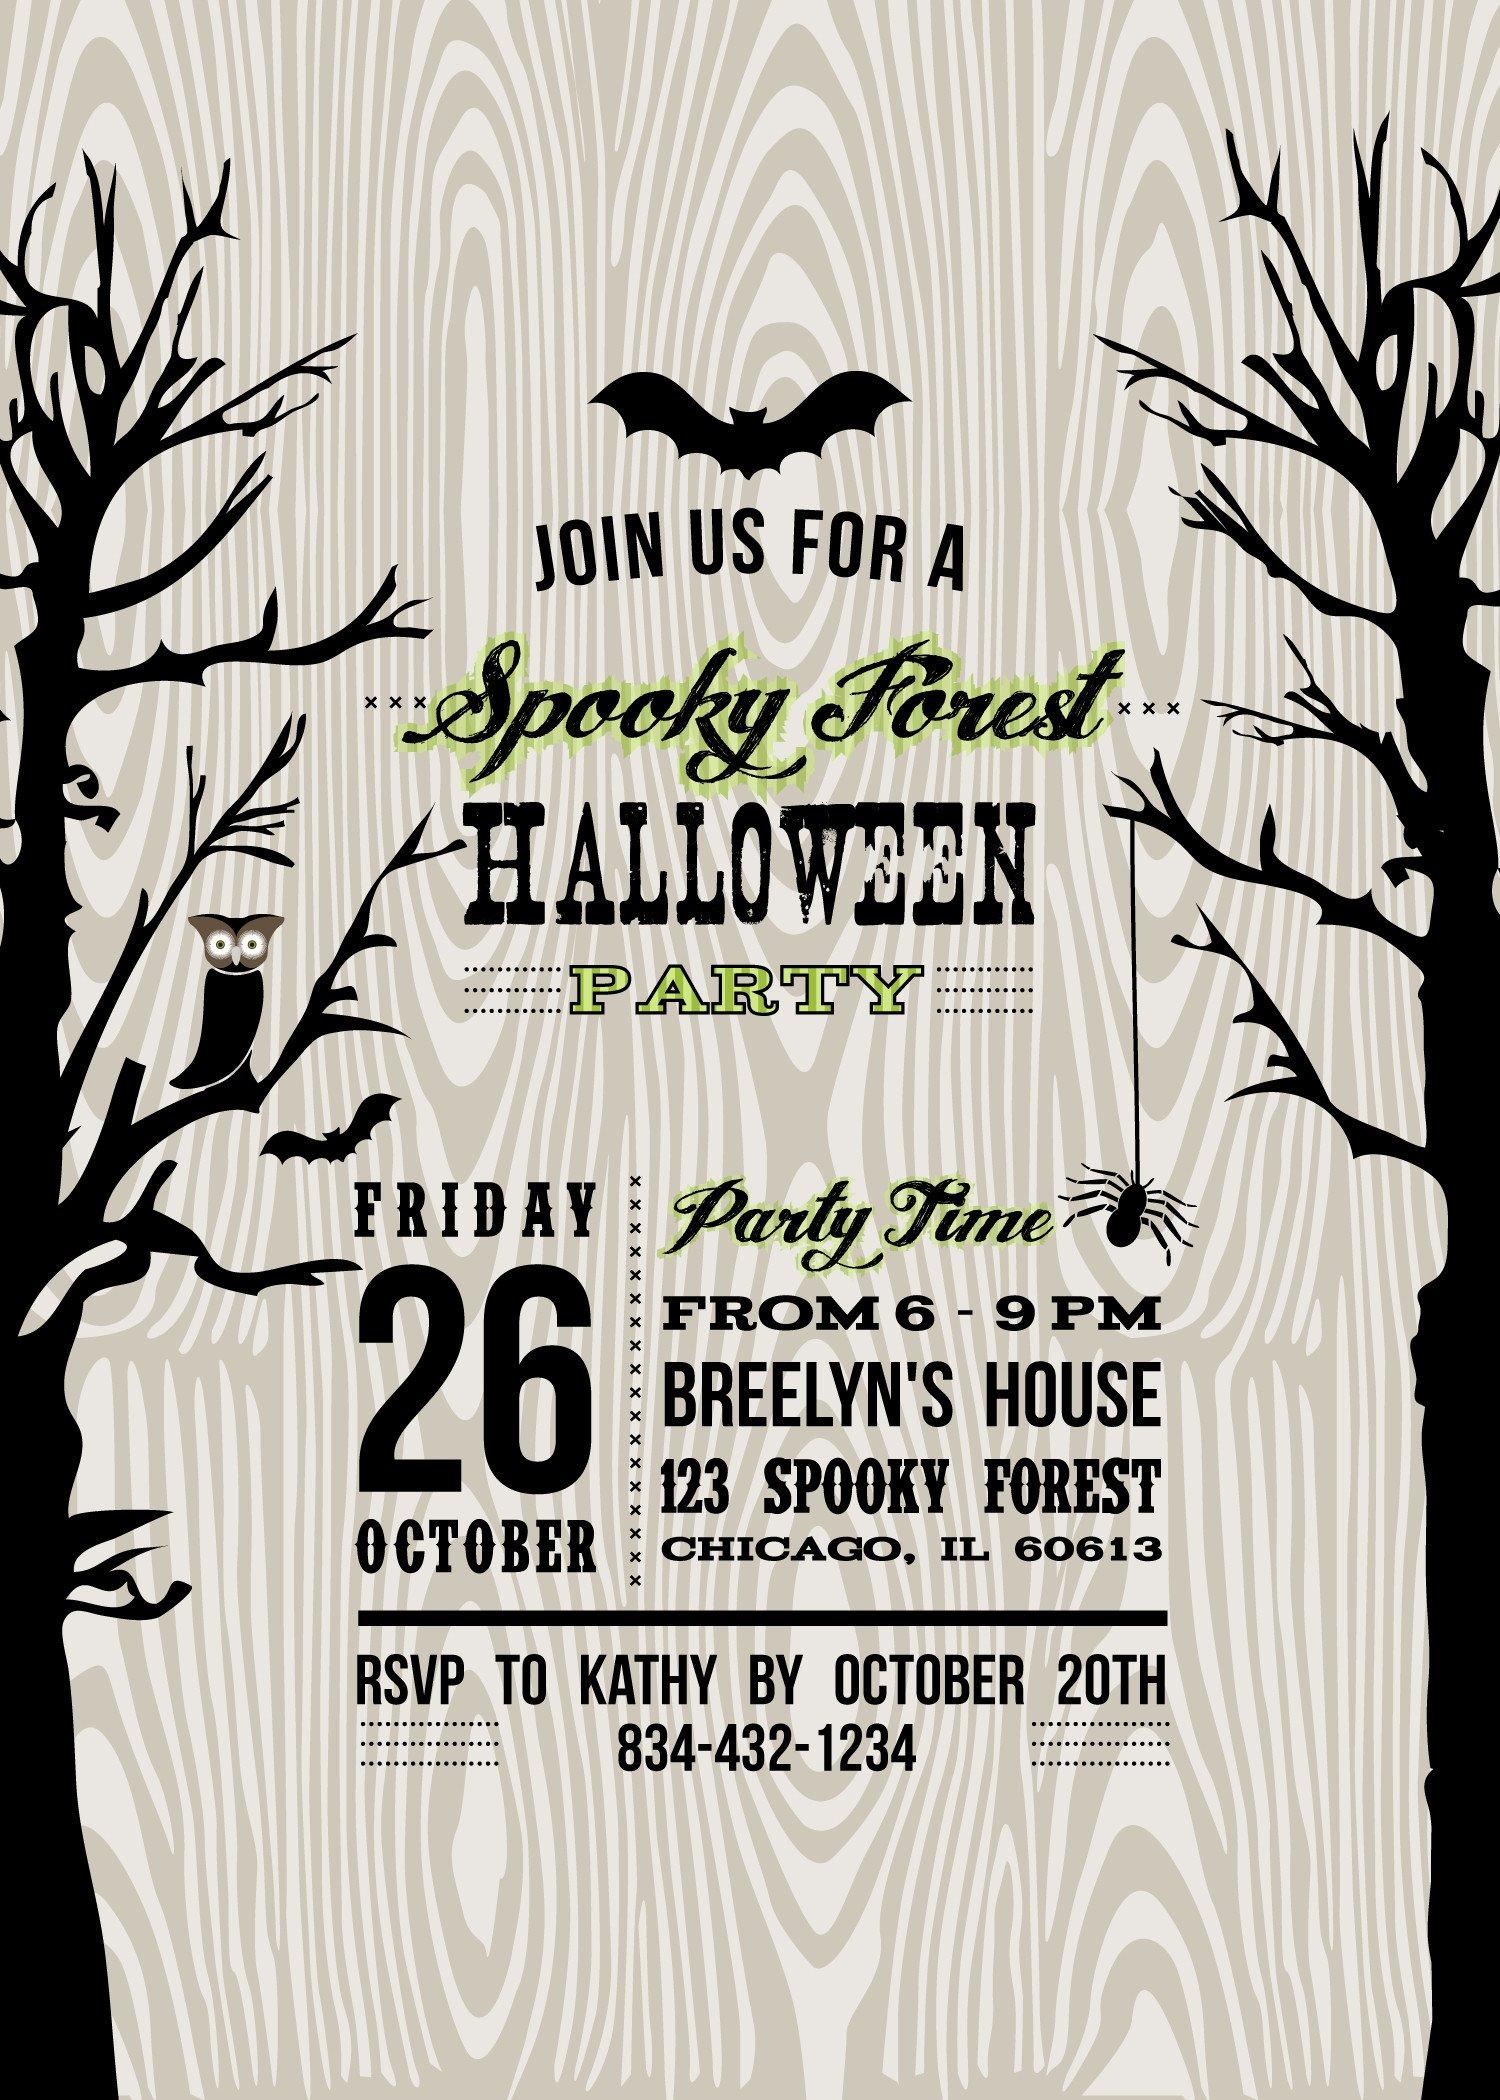 Free Halloween Invite Templates Lucas Halloween Party 2012 anders Ruff Custom Designs Llc